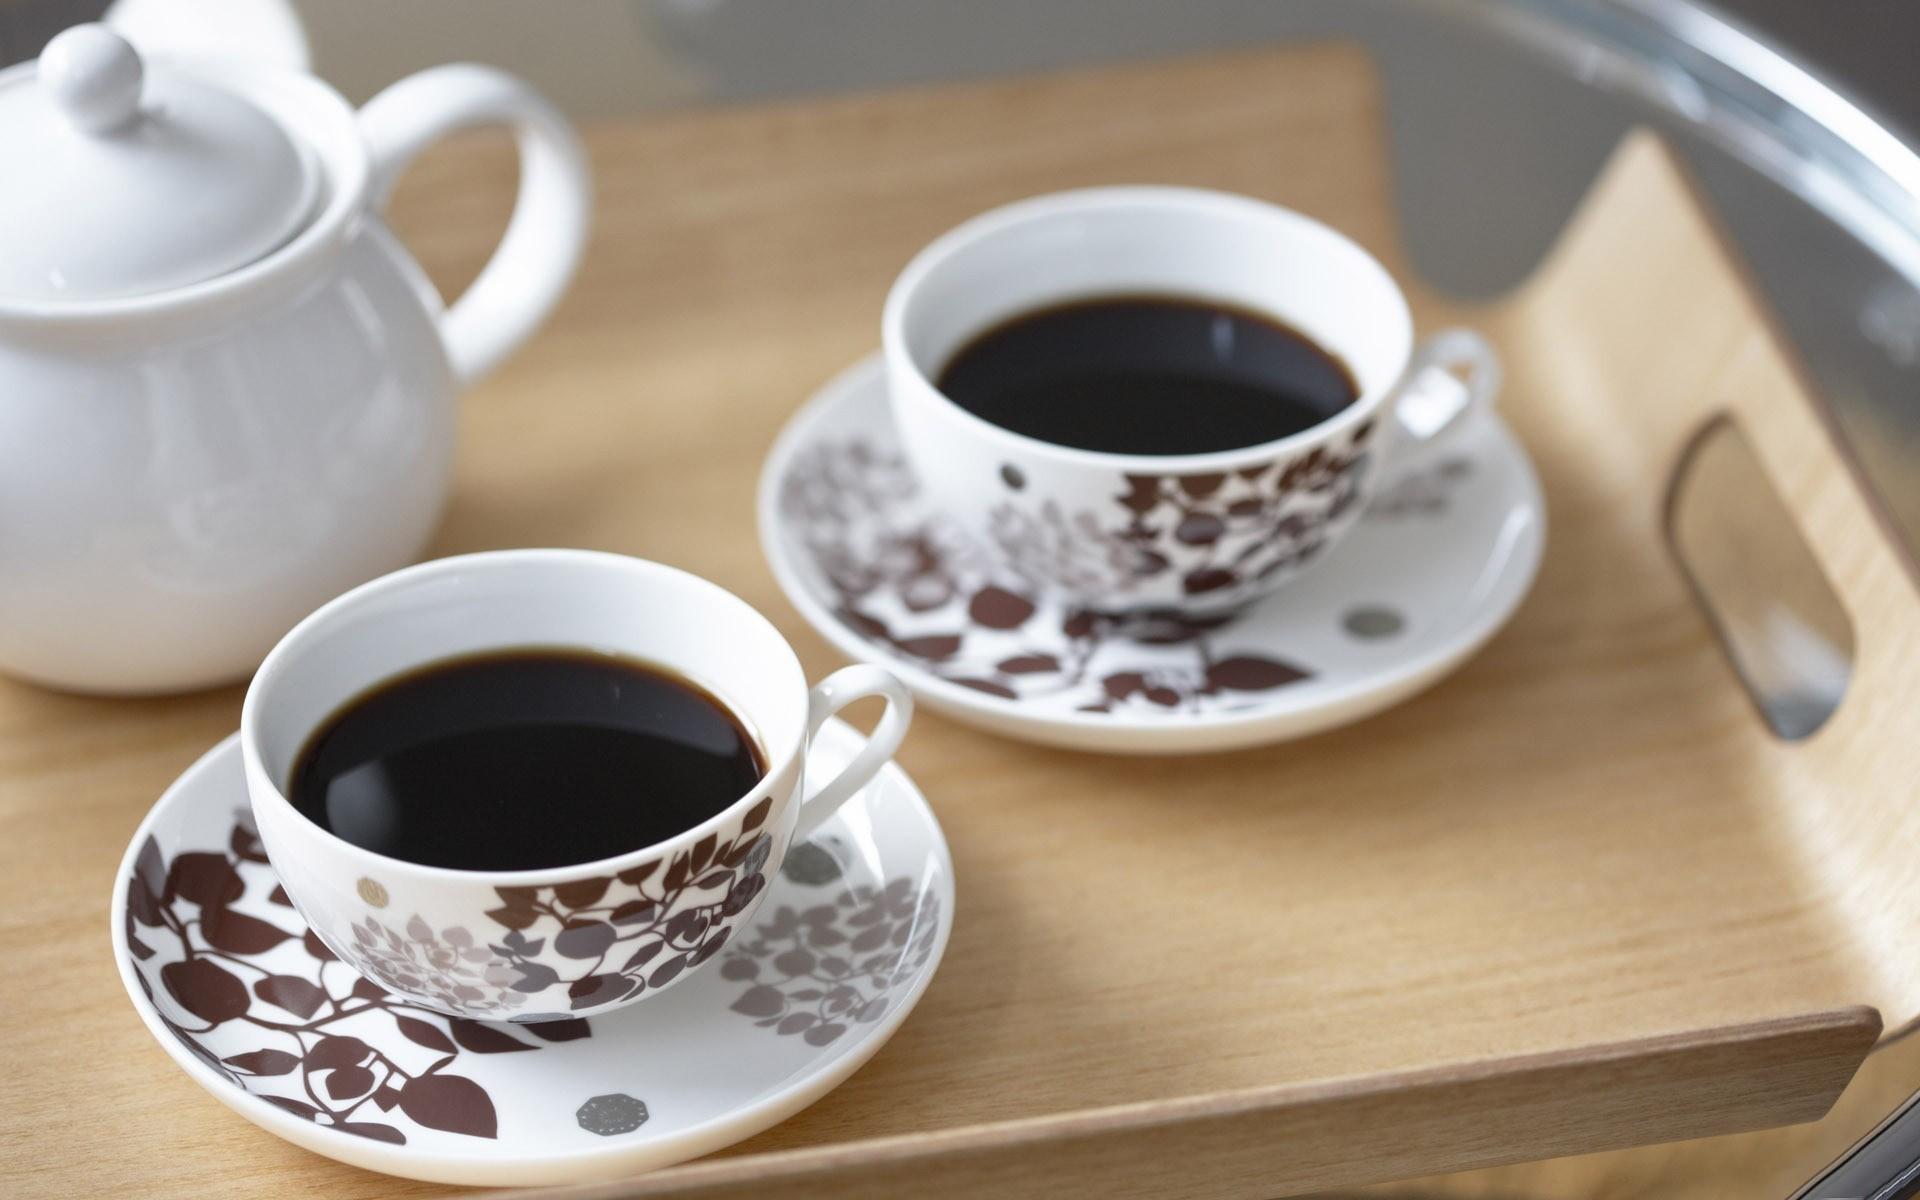 смайлик, две чашки кофе и кофейник картинки покрыта